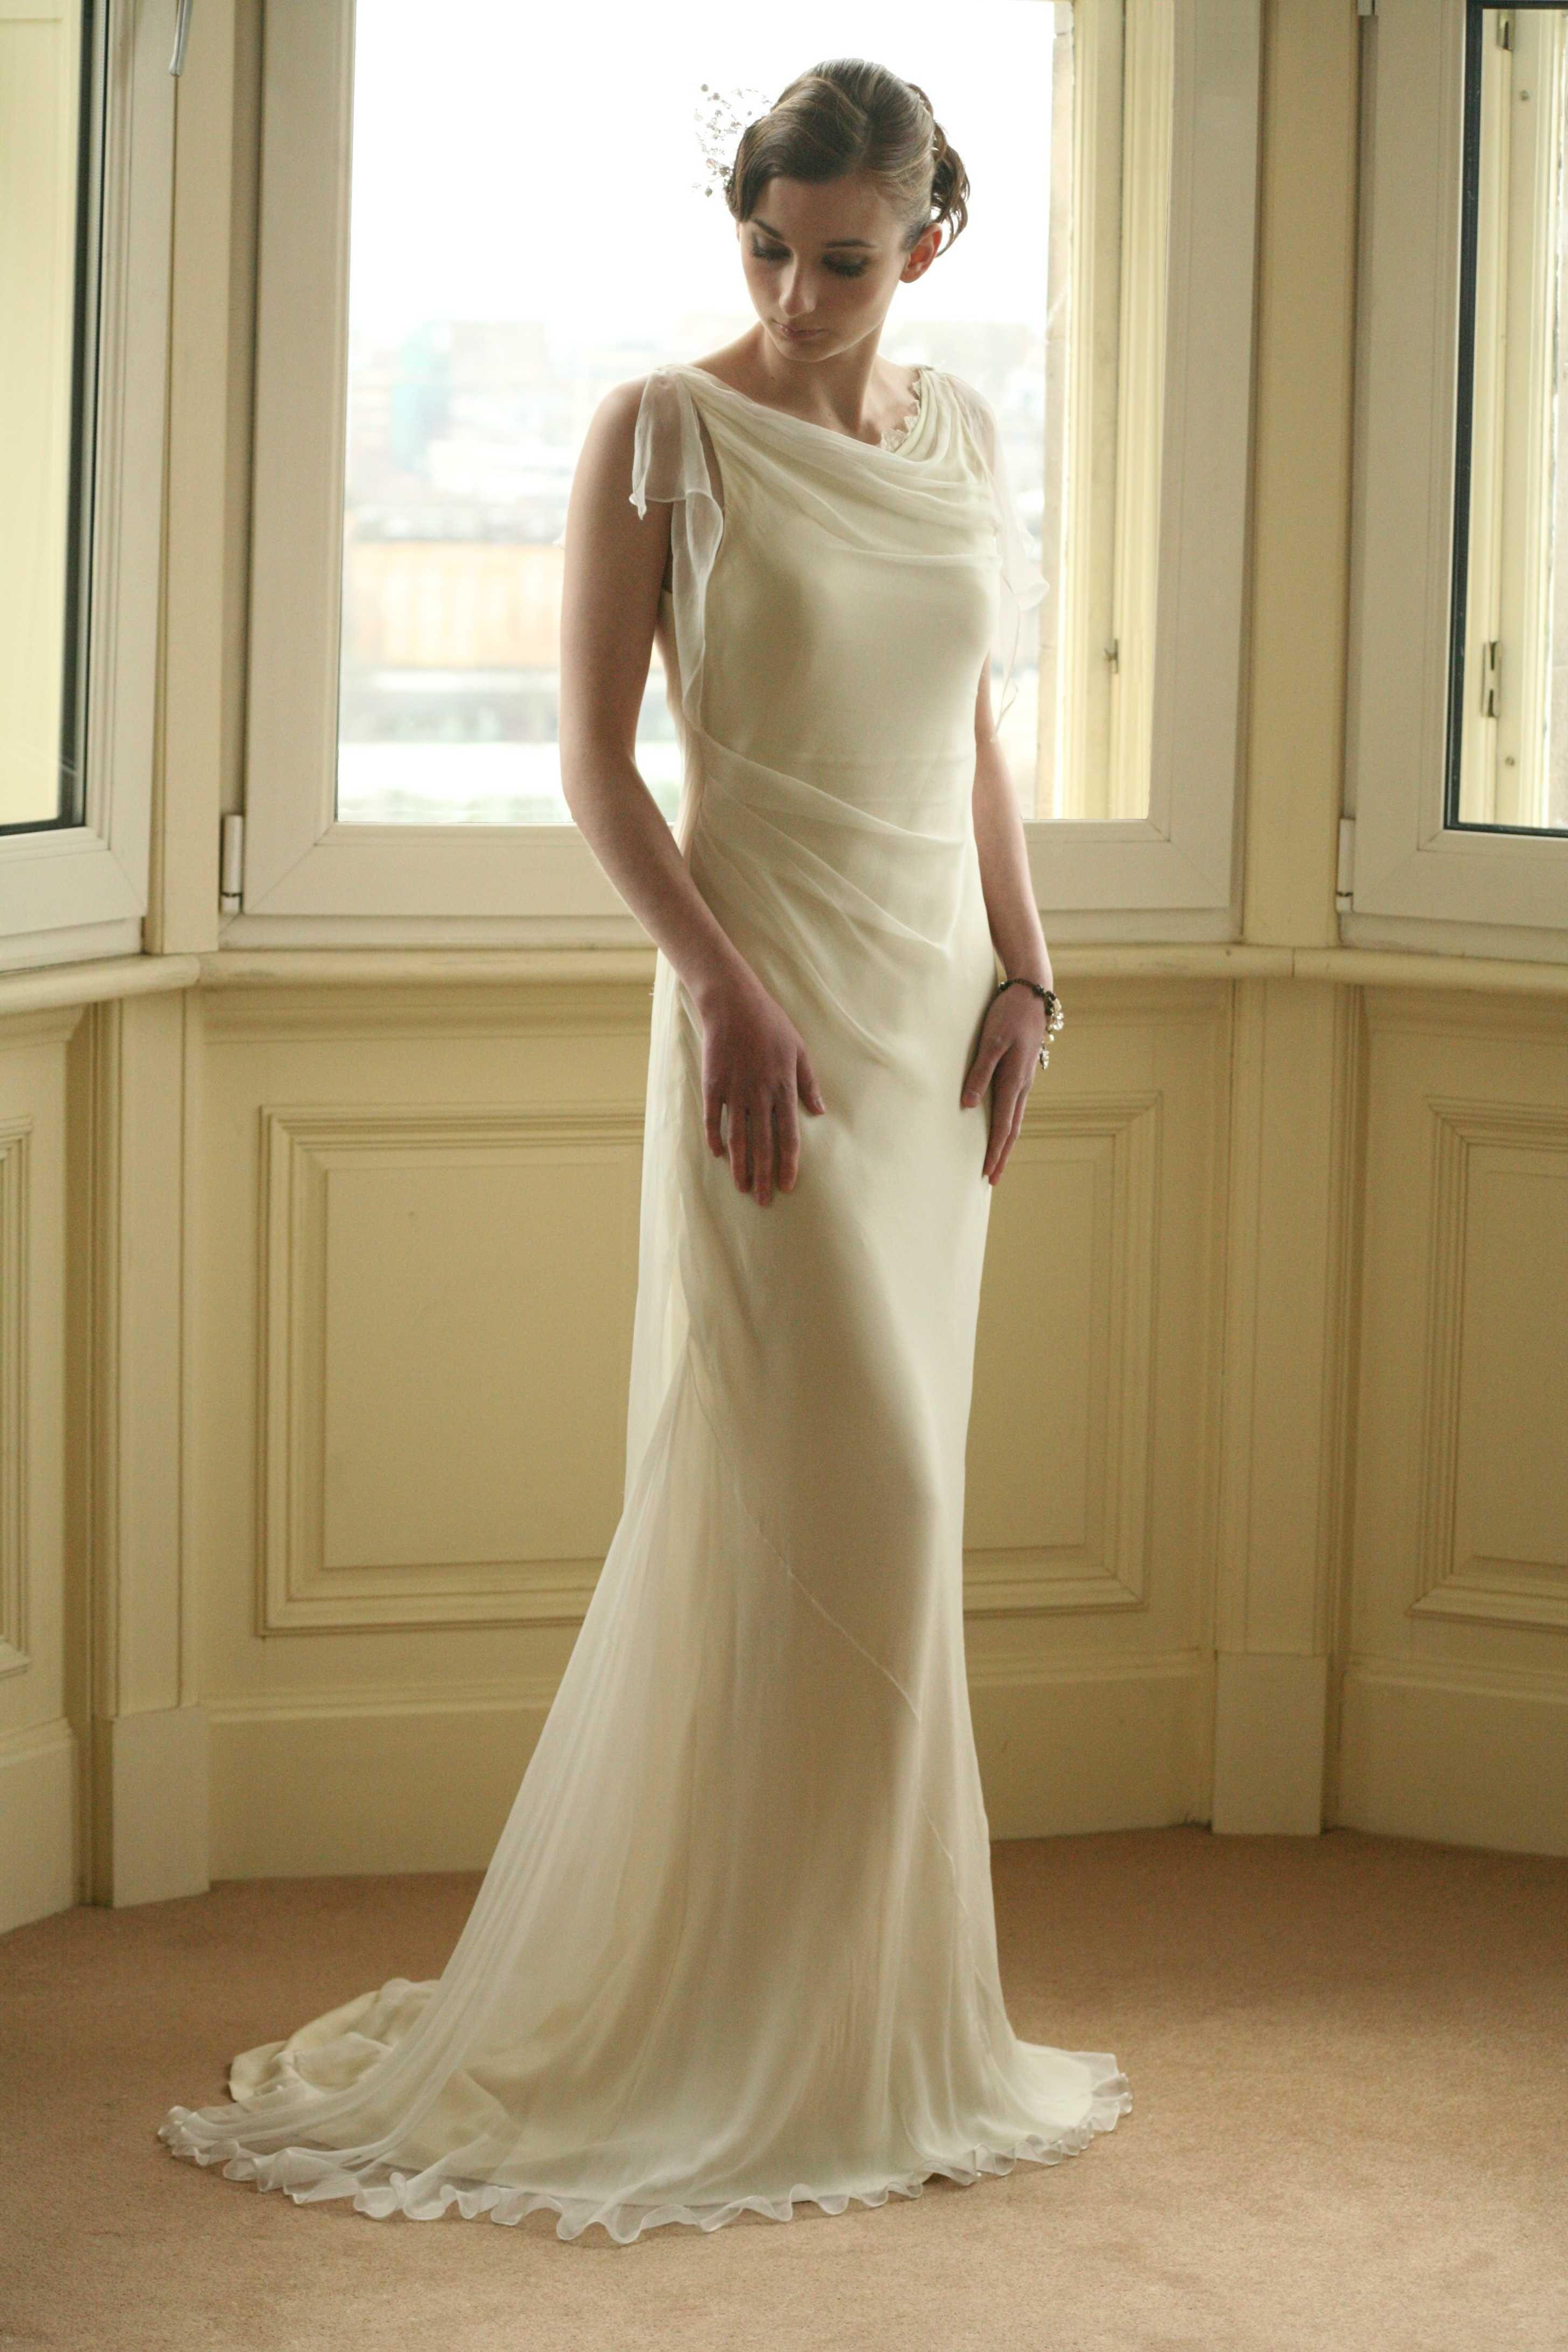 Ultimate Wedding Resourse Must See Daughters Wedding Stuff